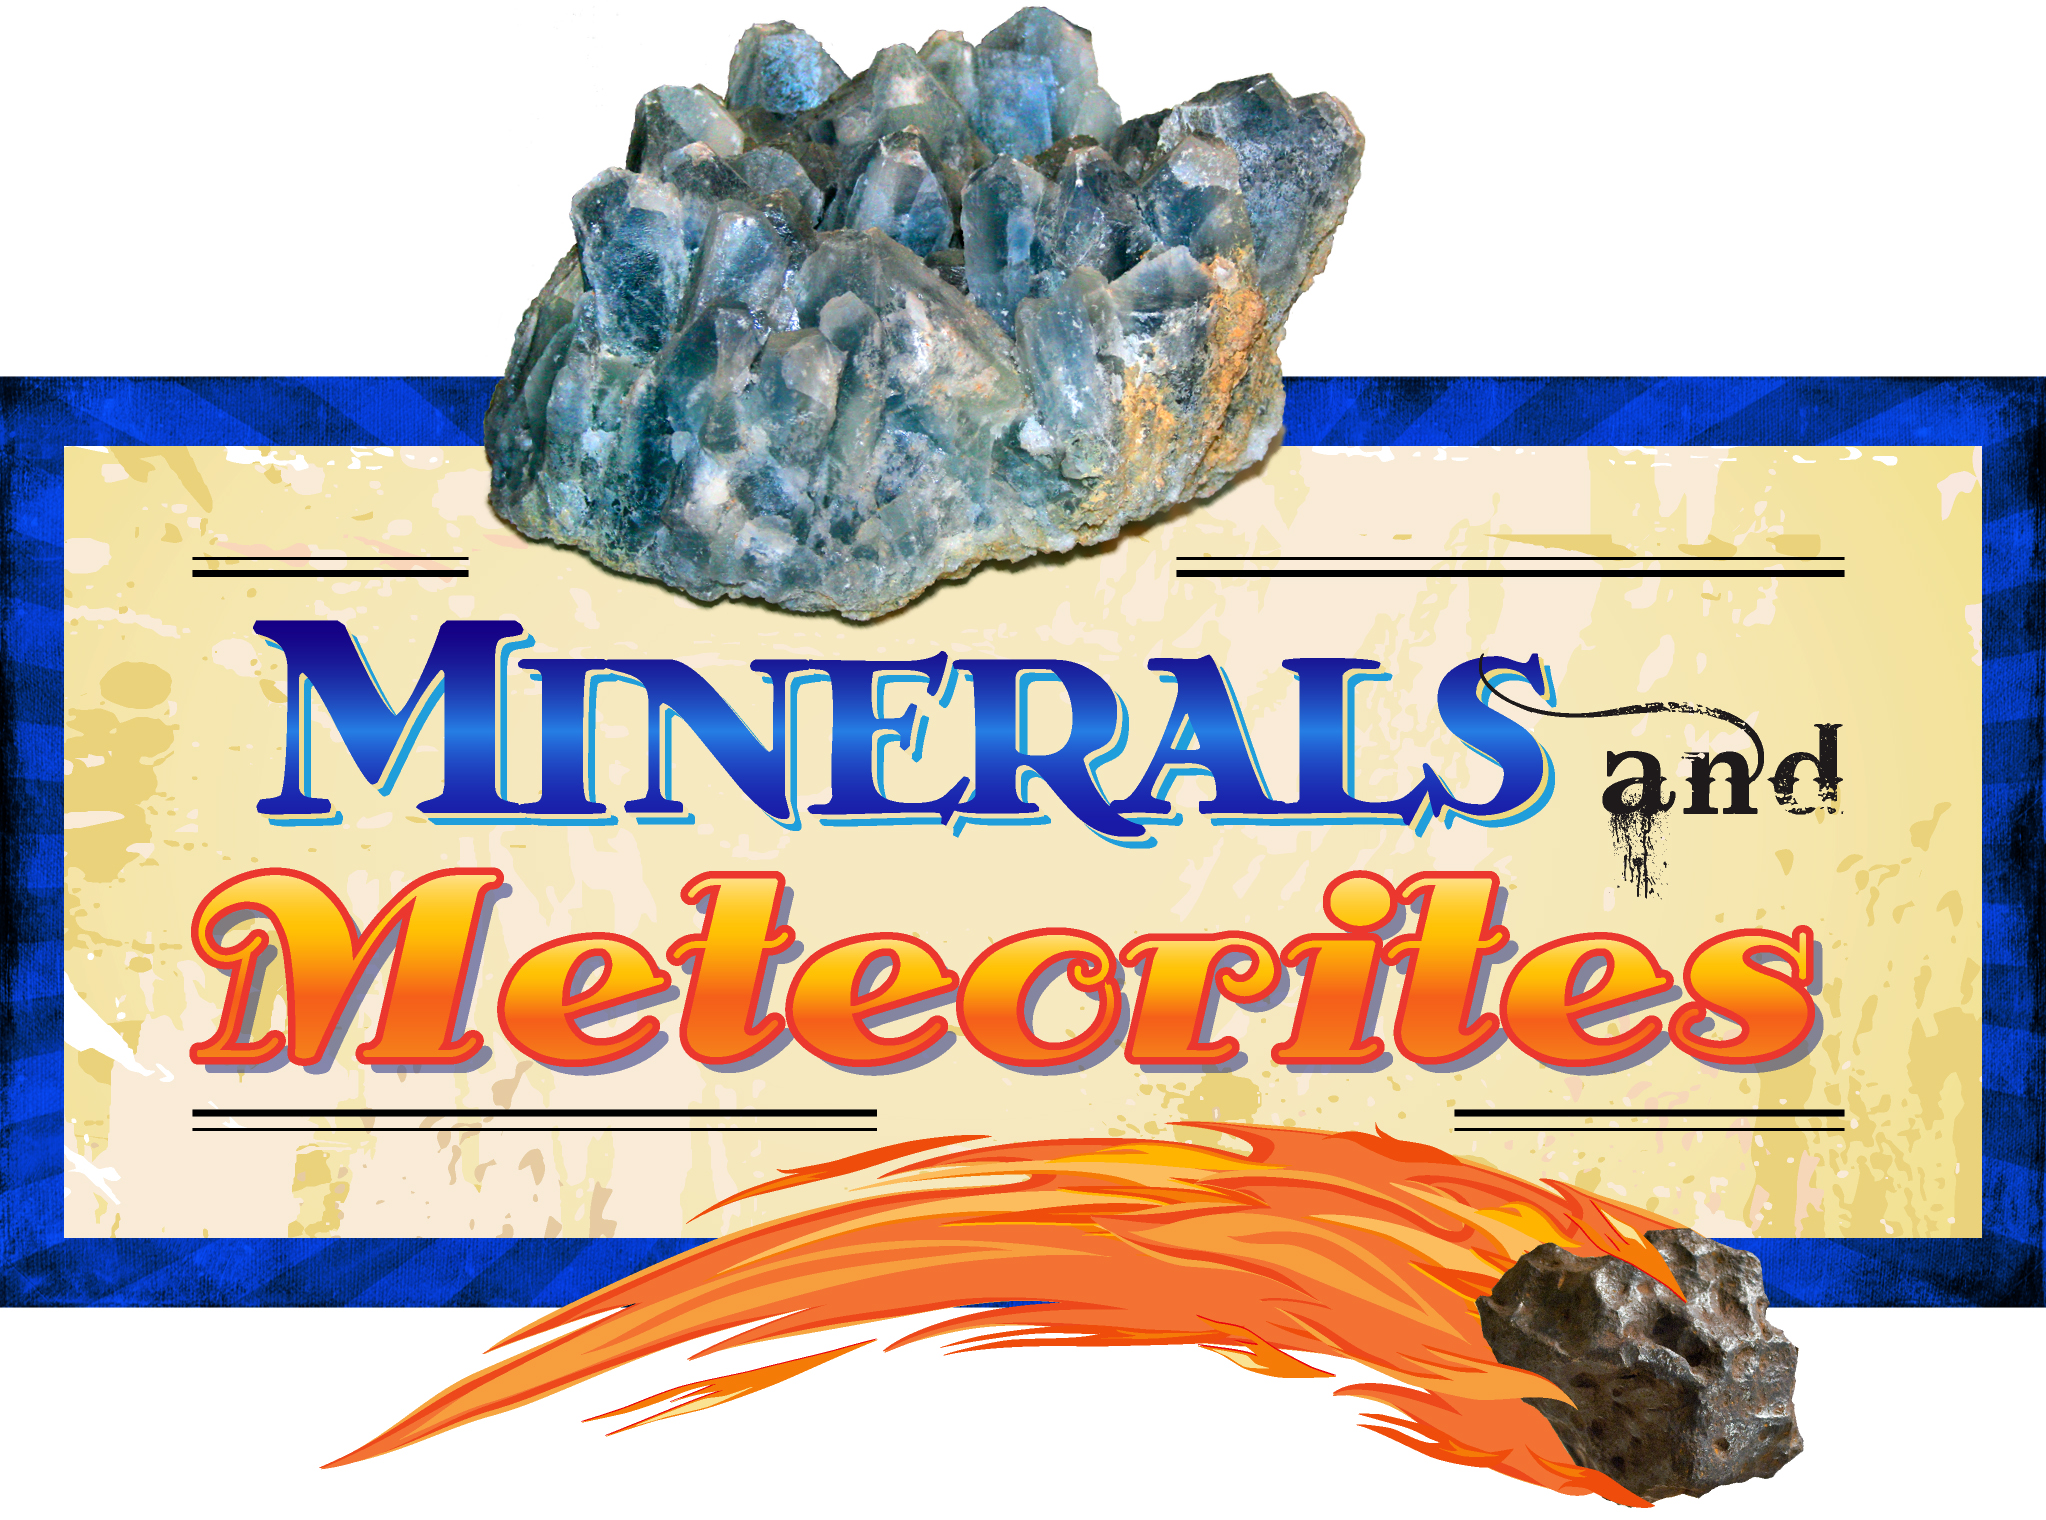 Morrill Hall's 'Minerals & Meteorites' exhibit opens April 21.